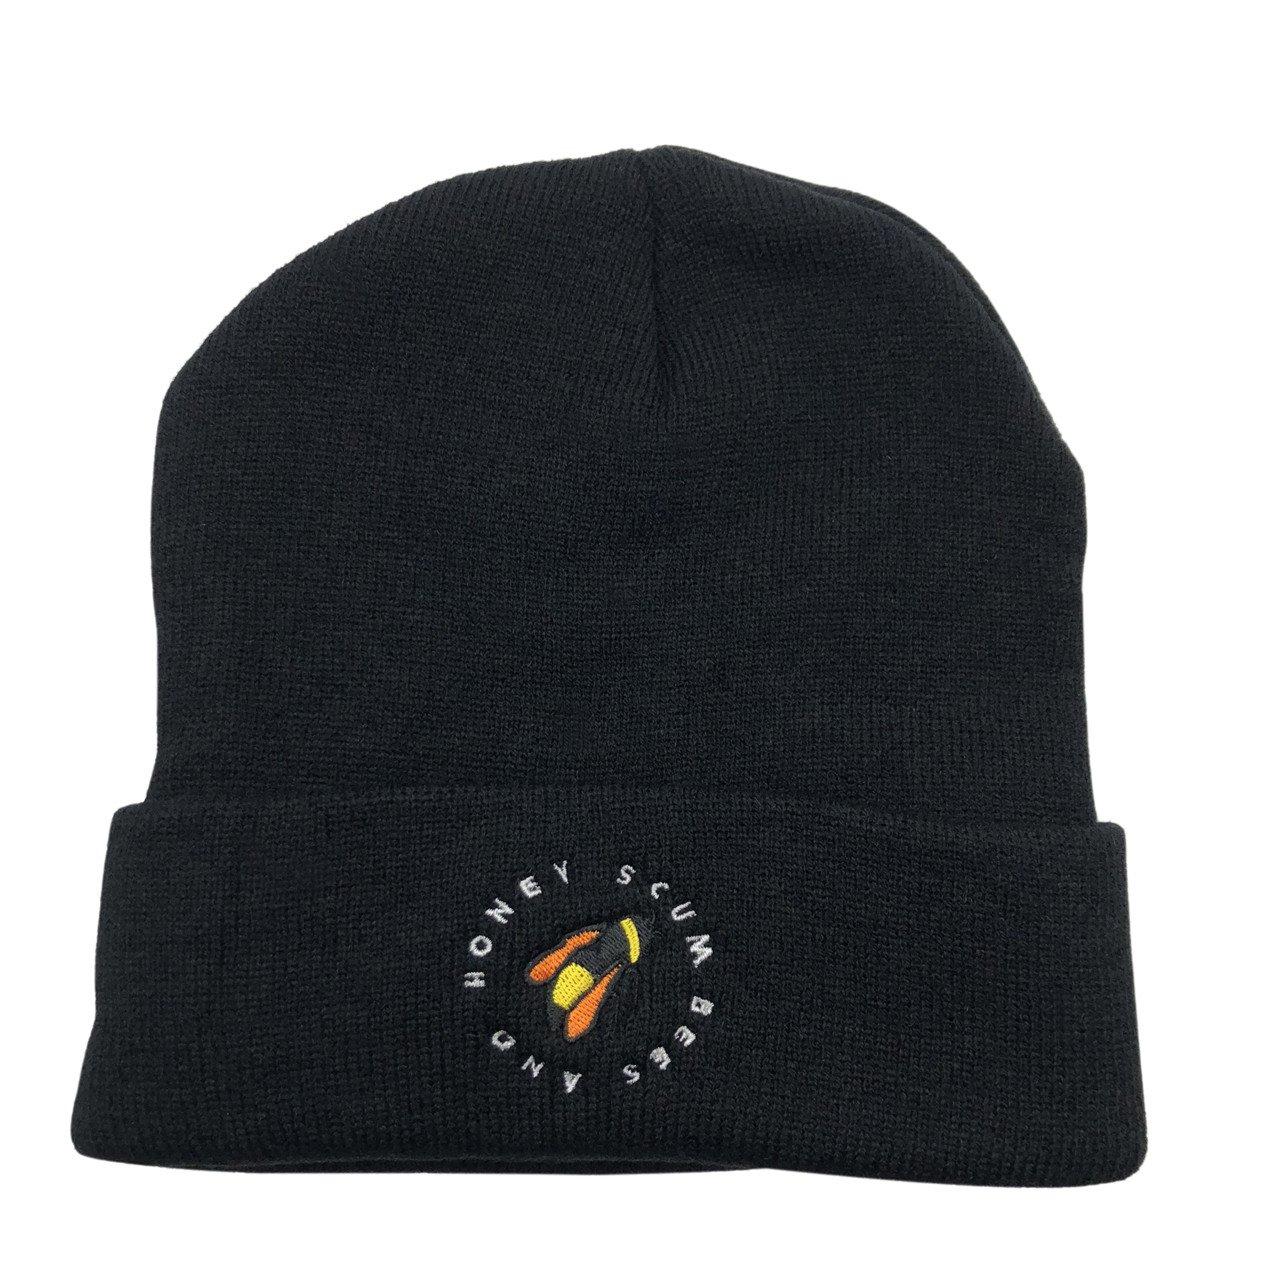 CZZYTPKK Golf Wang Warm Winter Hat Knit Beanie Skull Cap Bee Embroidered  Soft Headwear Black at Amazon Men s Clothing store  d0b959c3571